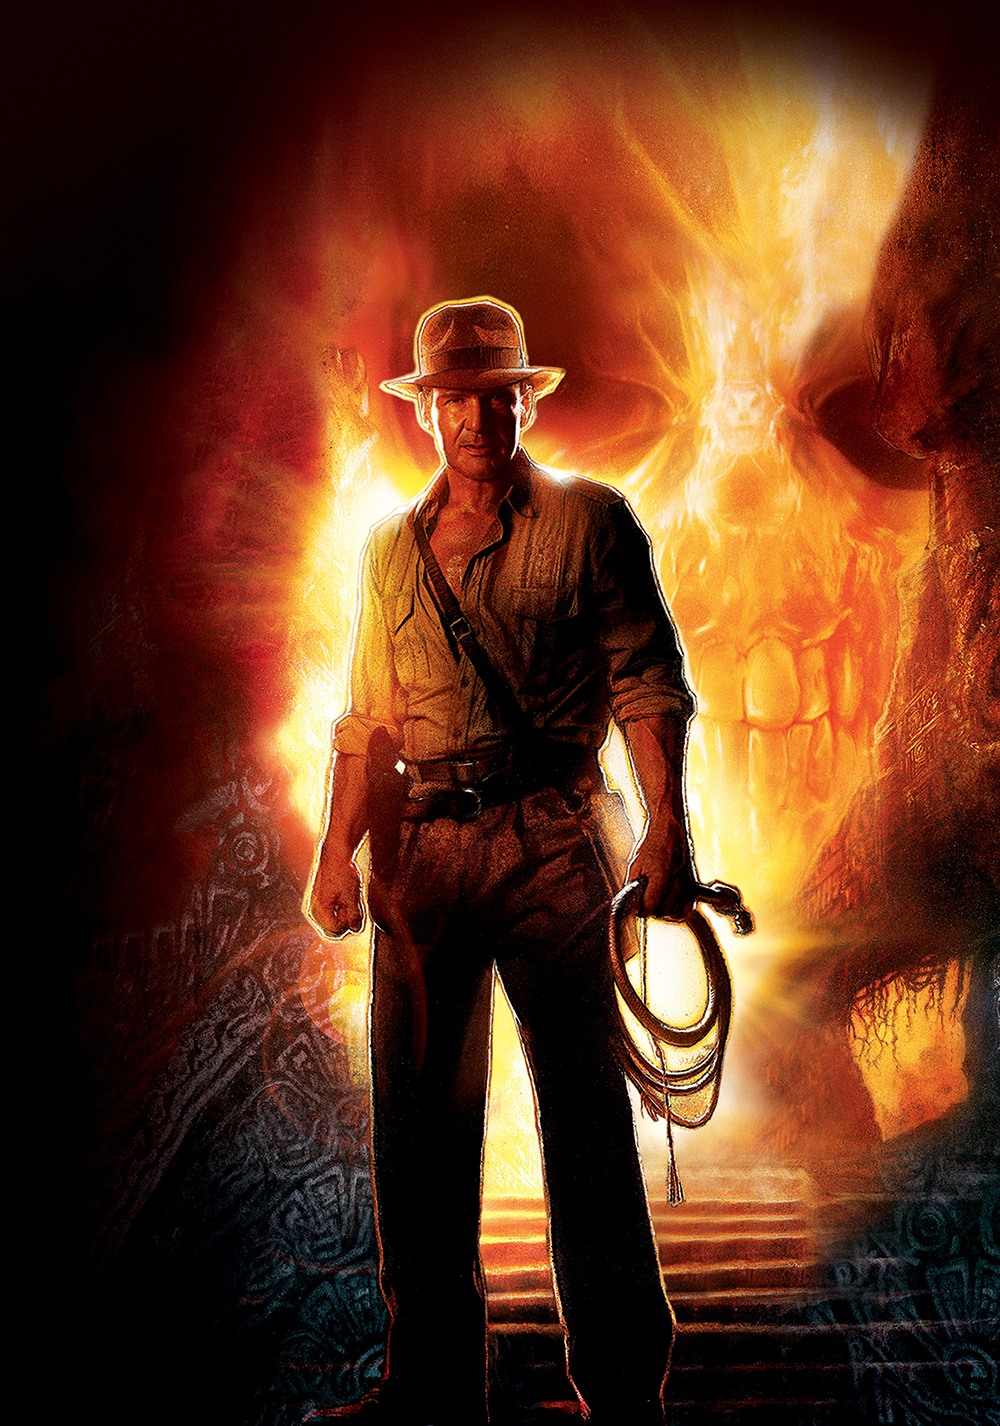 Indiana Jones and the Kingdom of the Crystal Skull | Movie